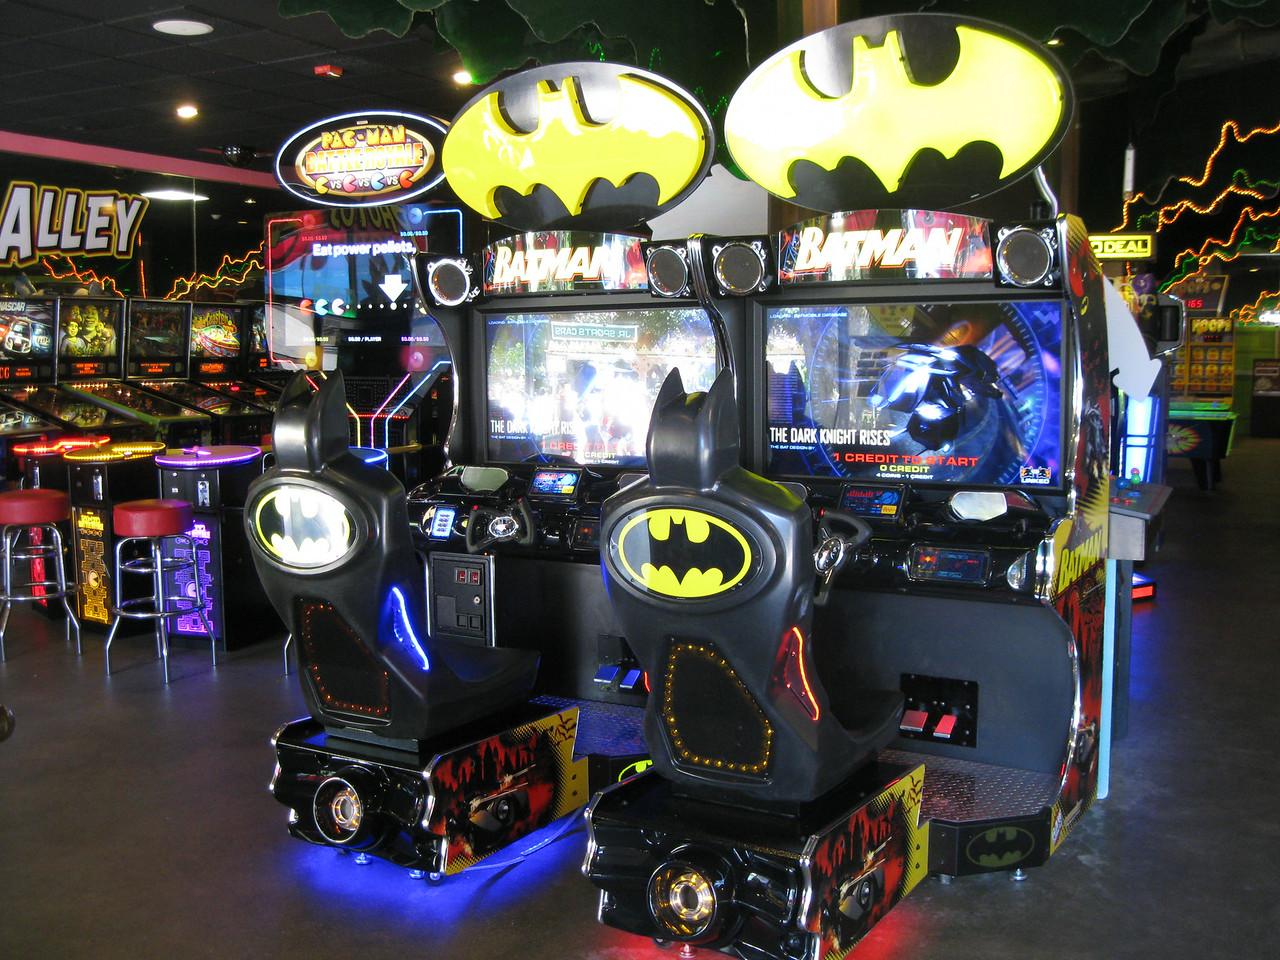 New Batman arcade games inside the Palace Arcade.